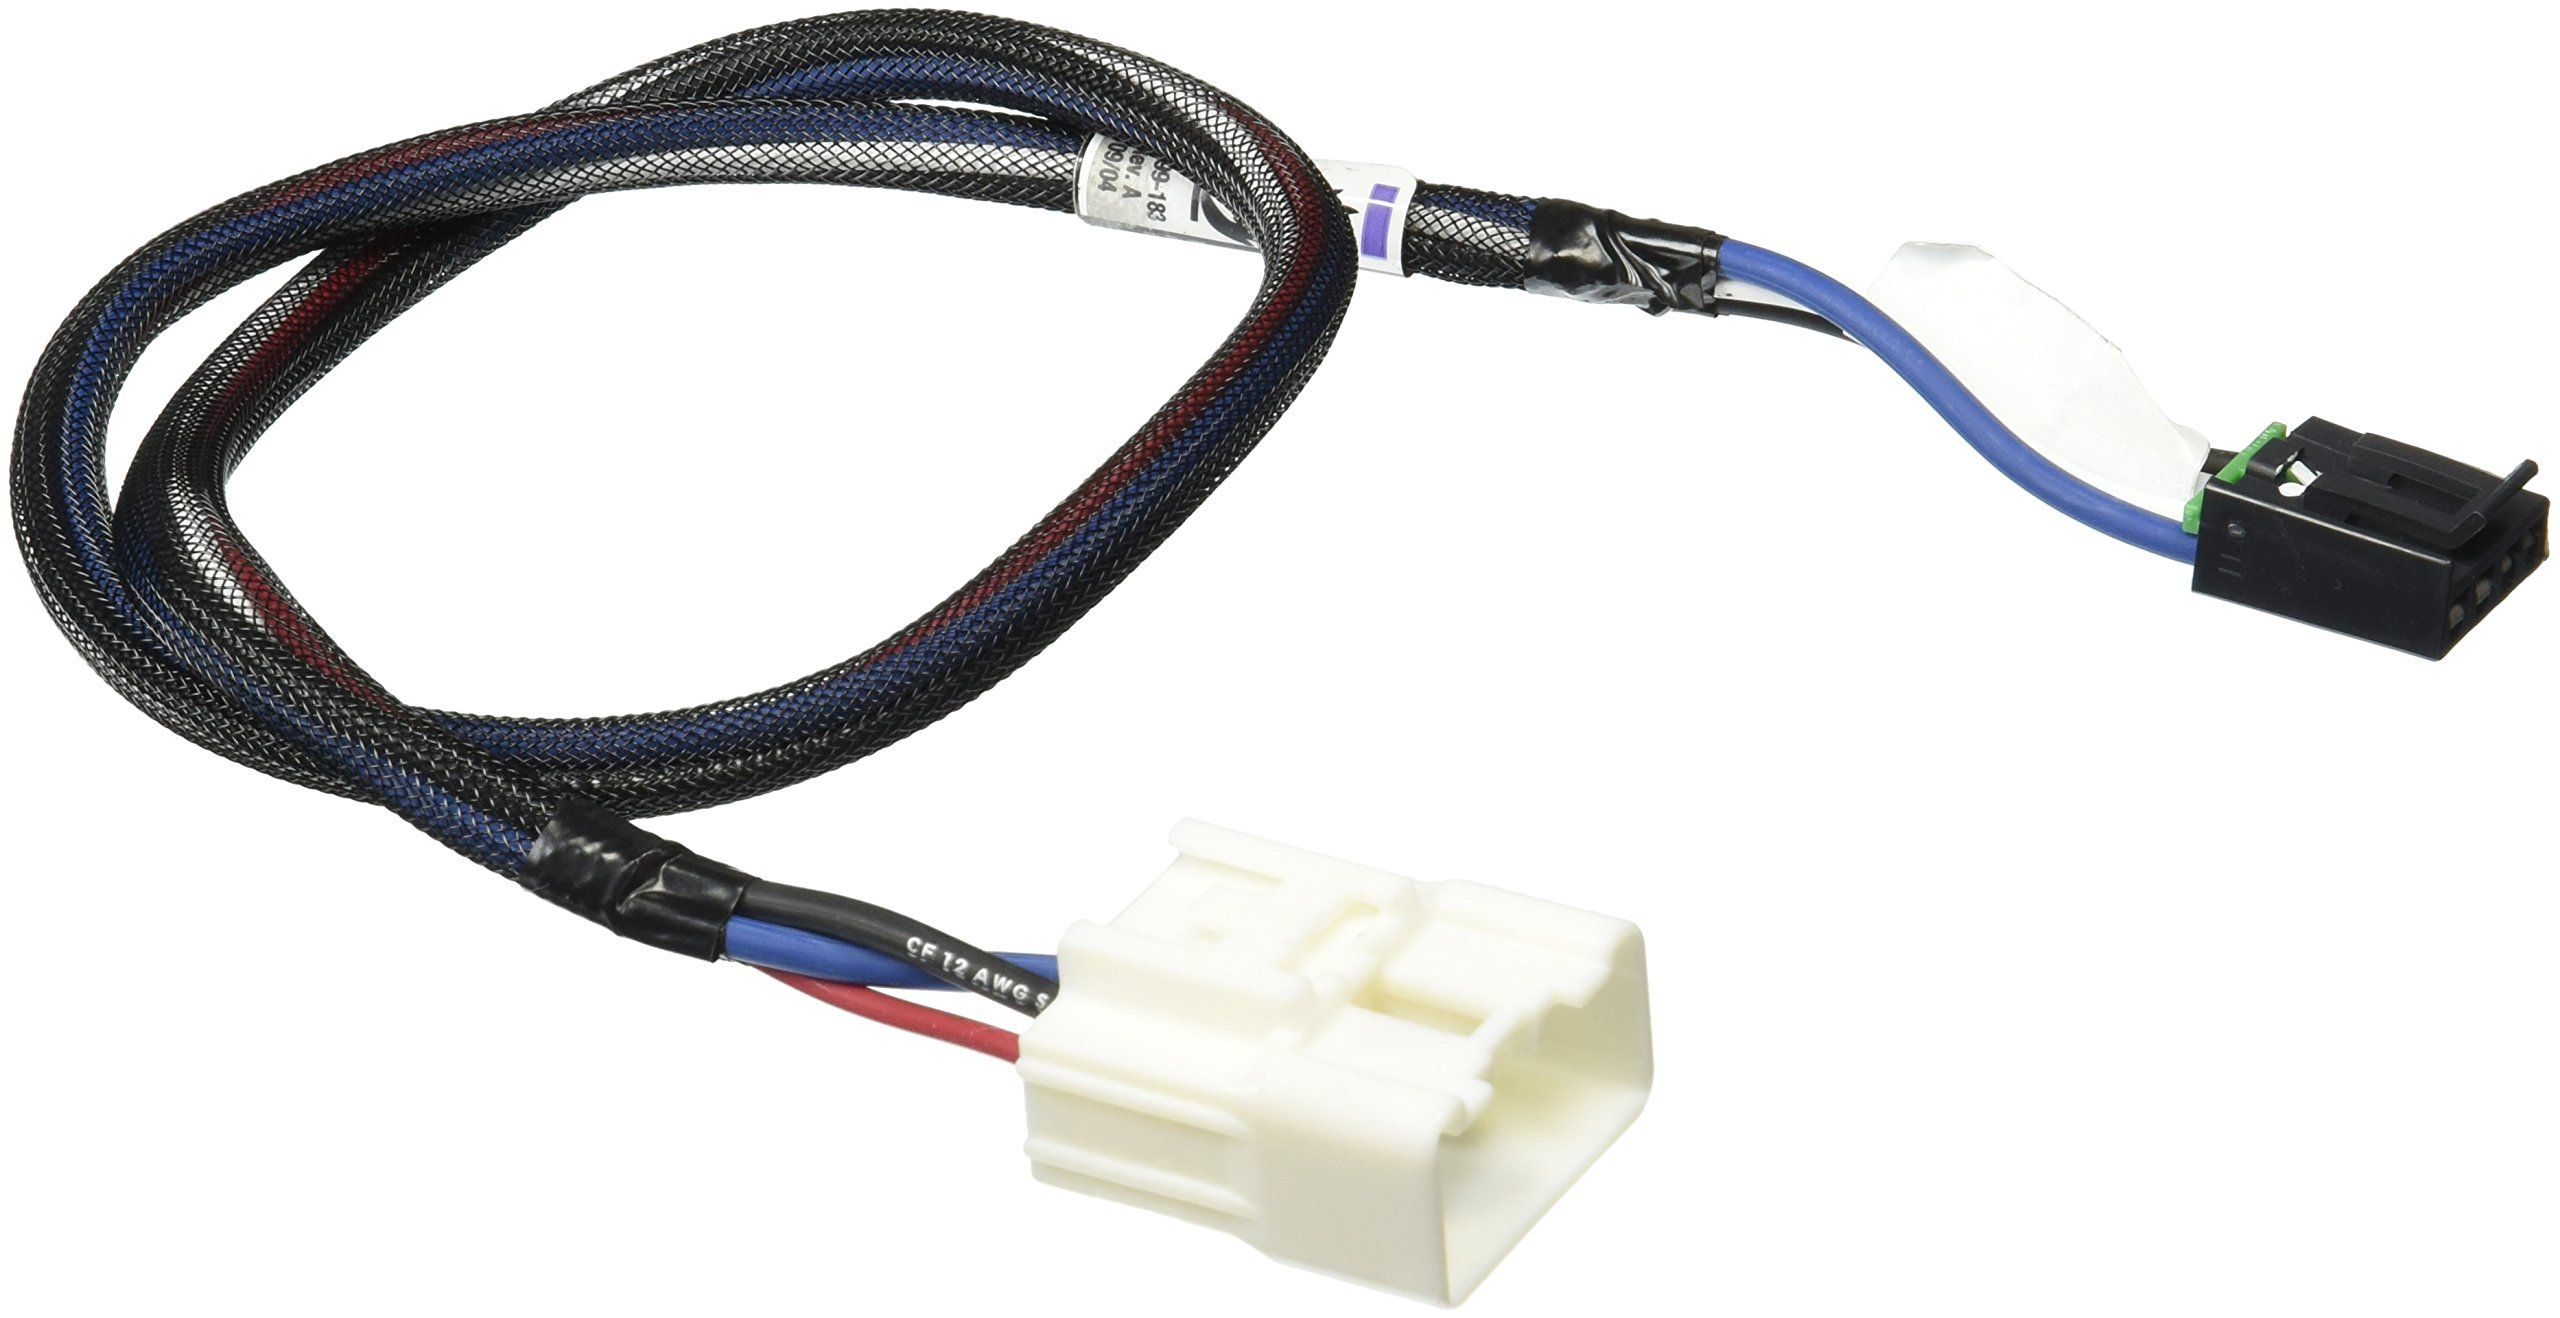 Tekonsha 3017-P Trailer Brake Control Wiring Harness - 2 Plugs, Toyota